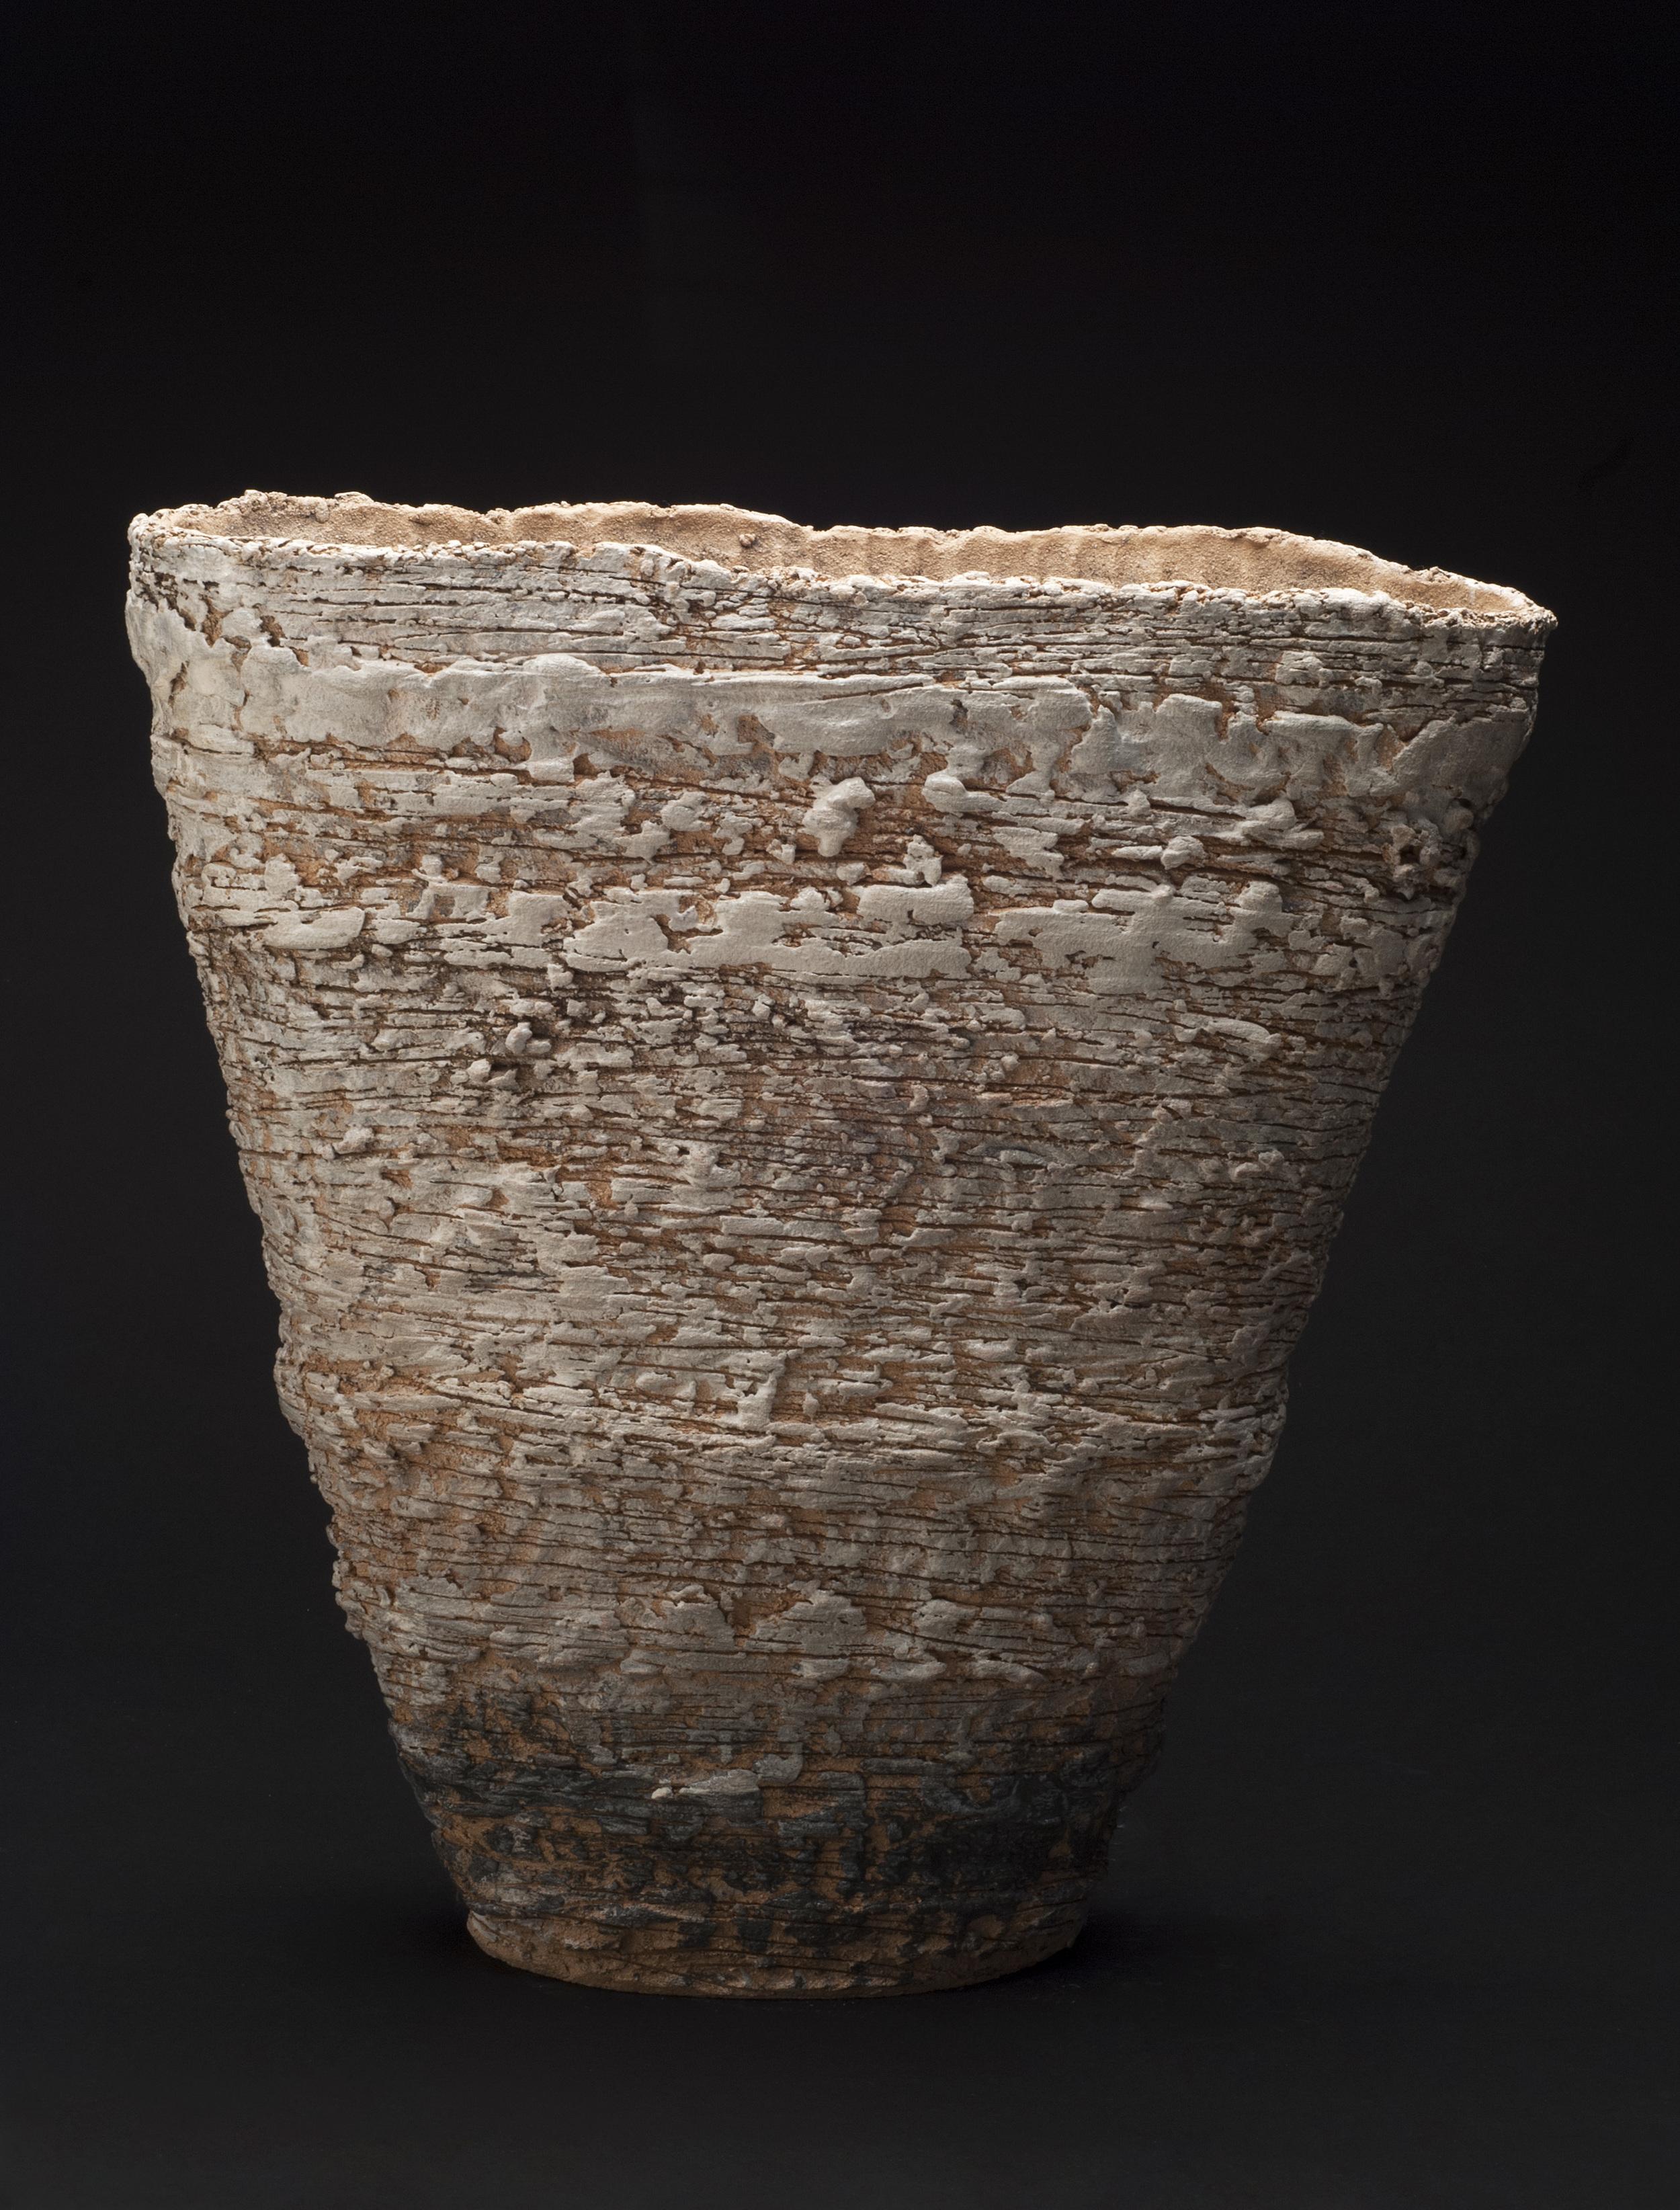 Sarah Purvey    Notion - Landscape Series  , 2010 Ceramic 16.54 x 15.75 x 5.91 inches / 42 x 40 x 15 cm / SPu 1